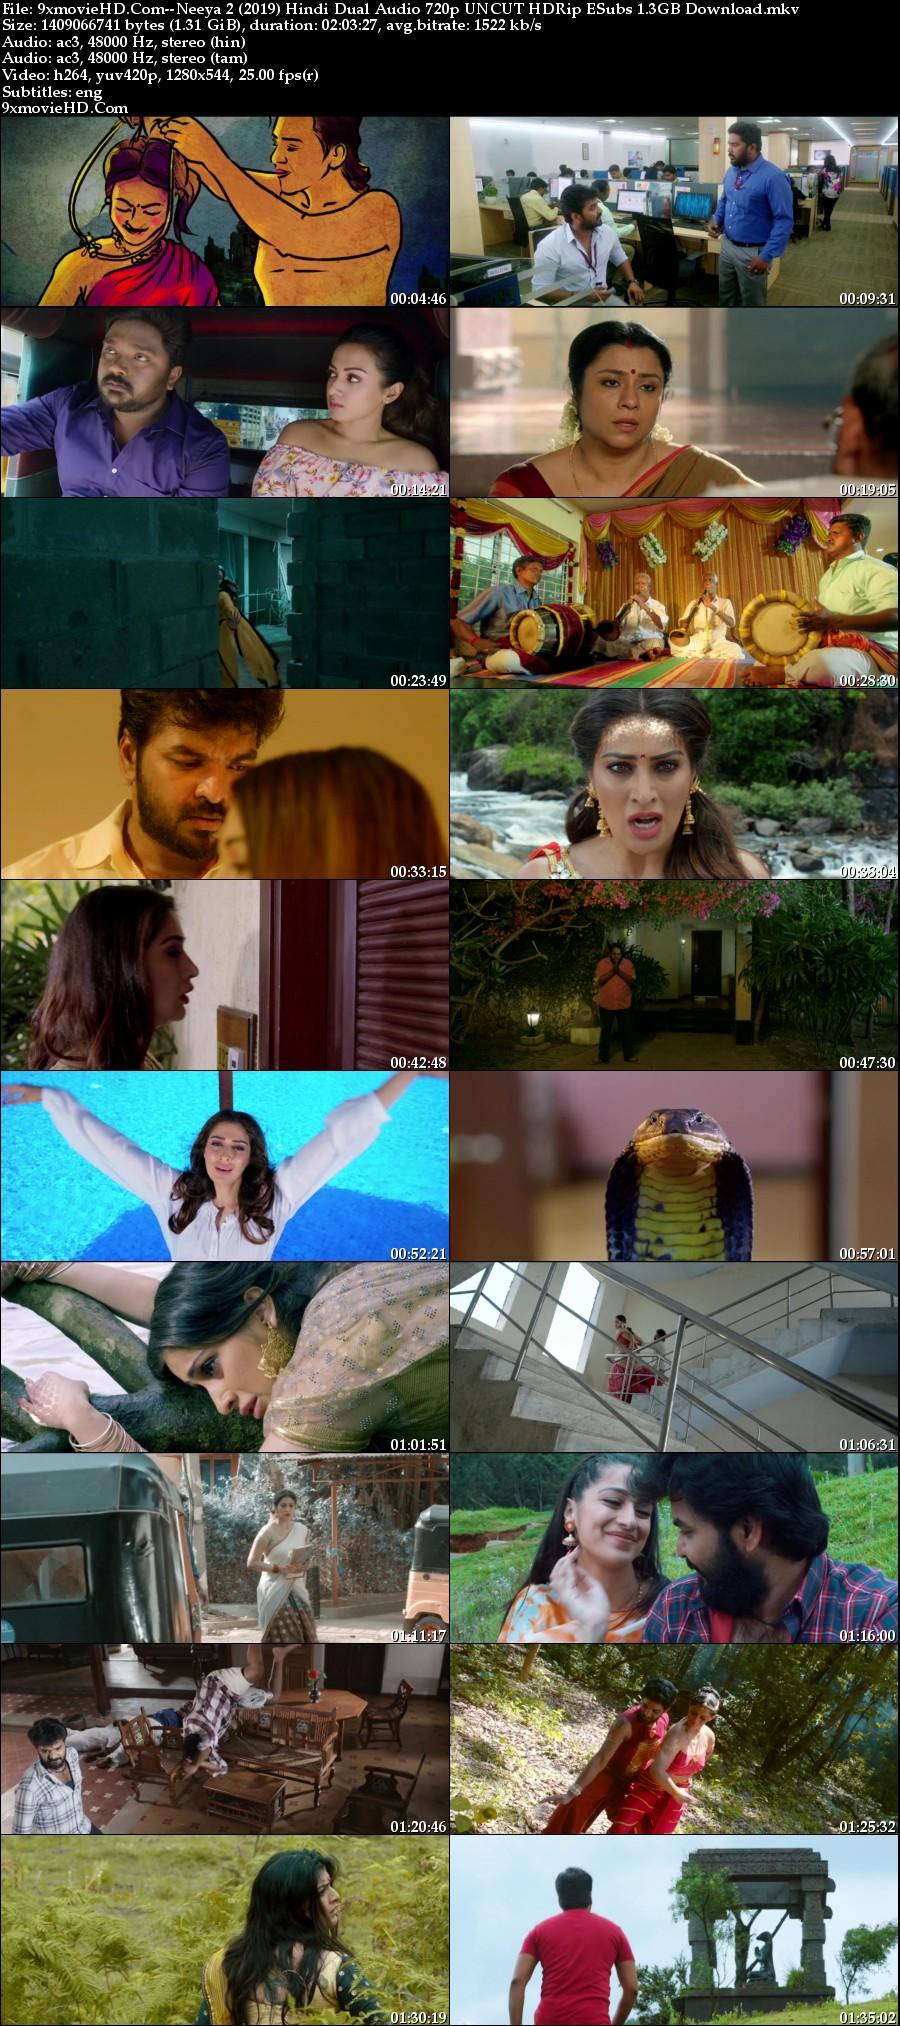 9xmovie-HD-Com-Neeya-2-2019-Hindi-Dual-Audio-720p-UNCUT-HDRip-ESubs-1-3-GB-Download